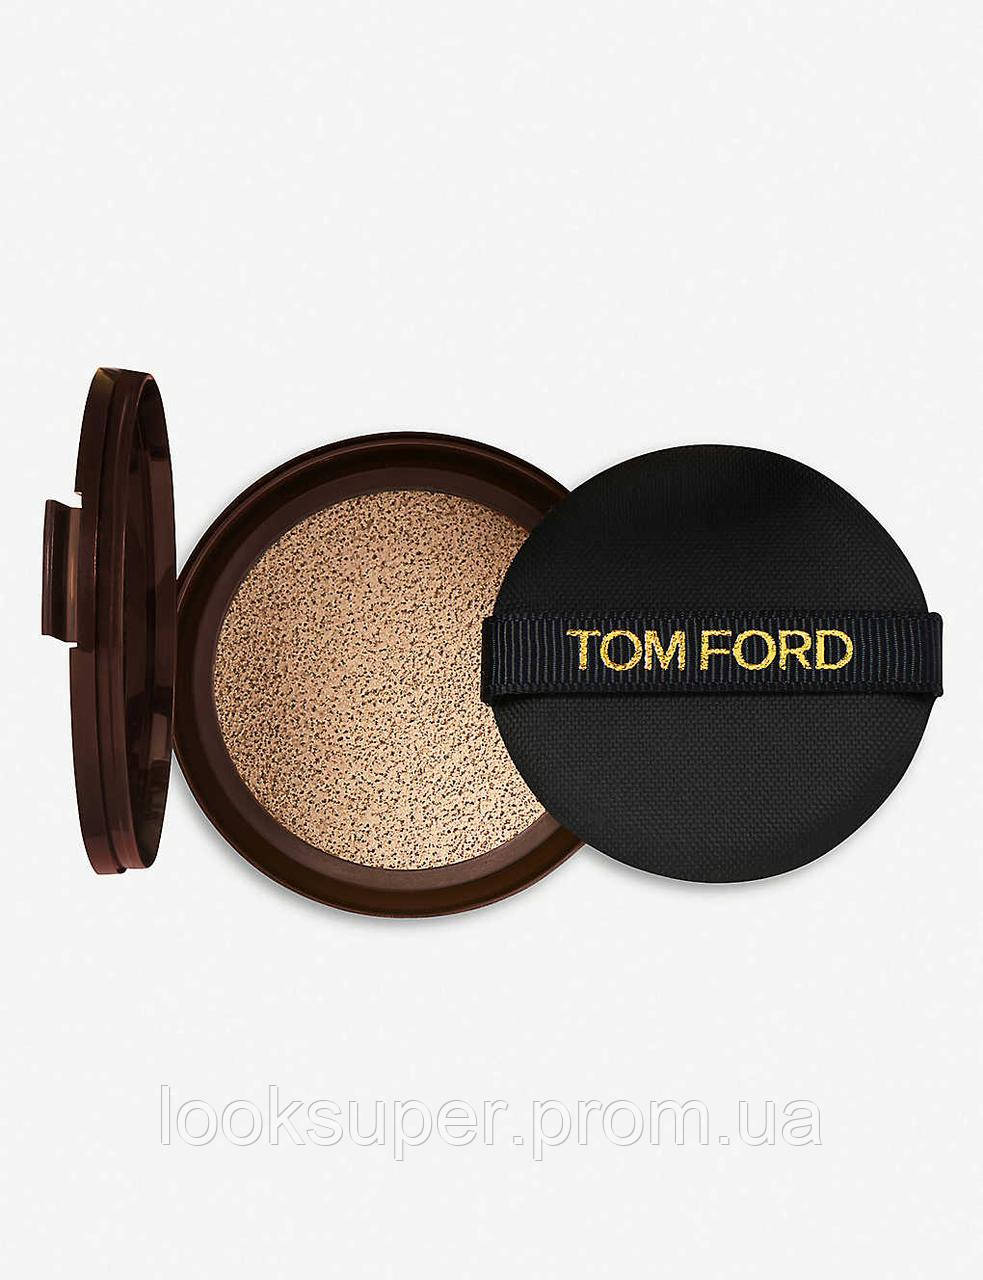 Запасной блок основы под макияж TOM FORD TRACELESS TOUCH FOUNDATION SPF 45 REFILL  BUFF